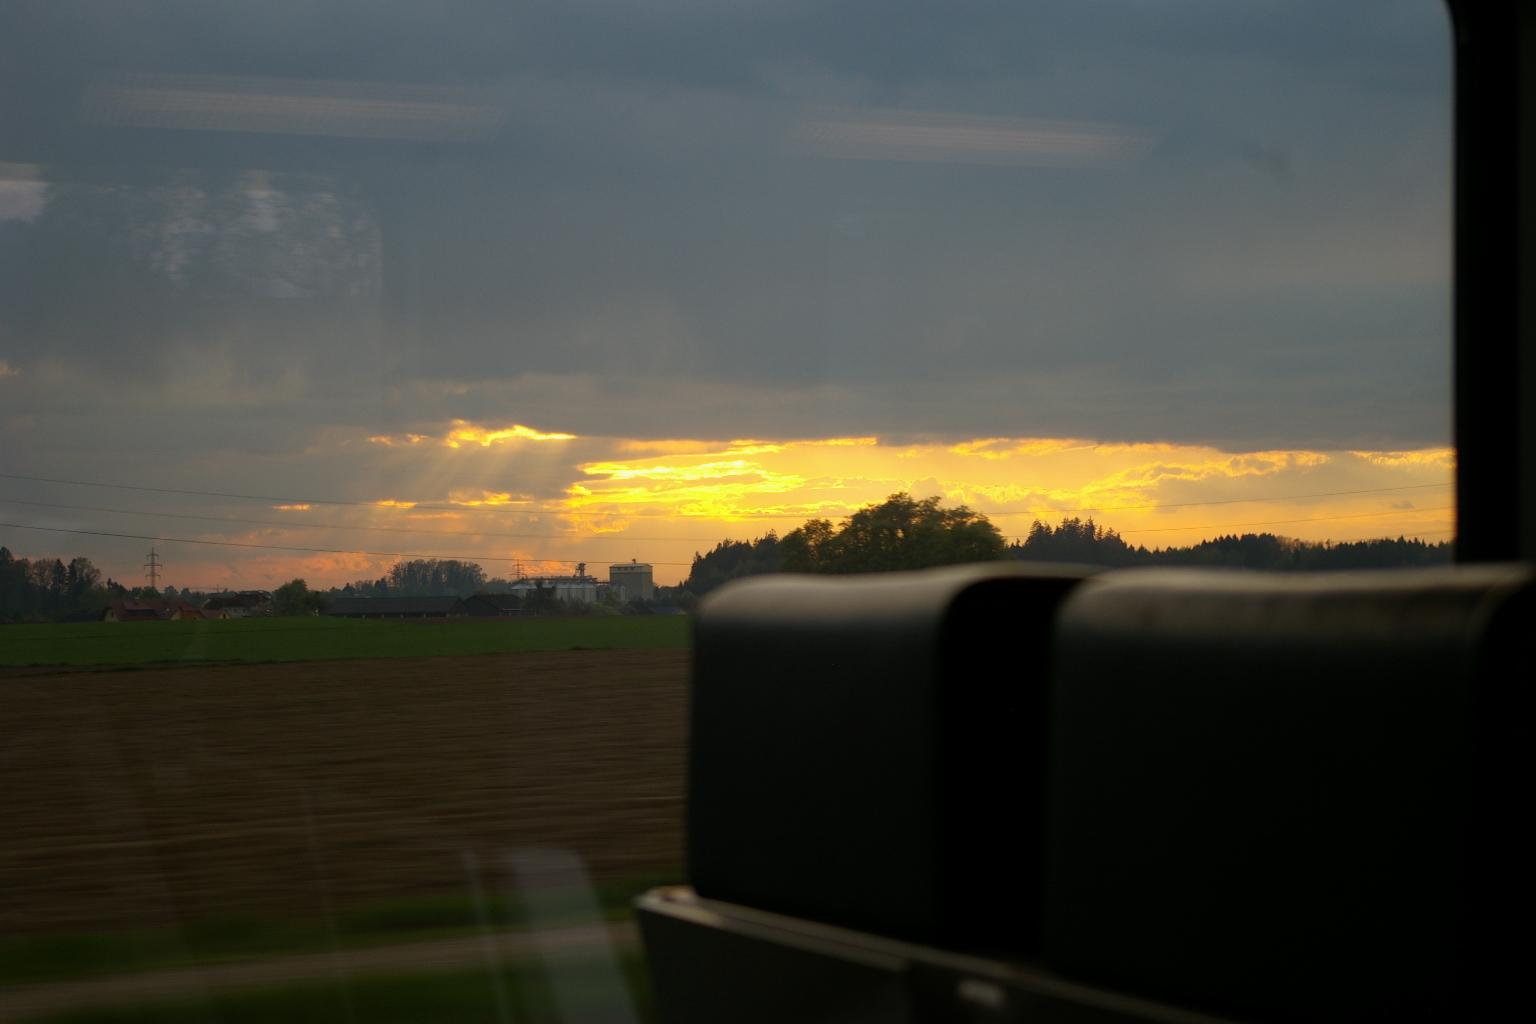 Sonnenuntergang bei 200 Km/h